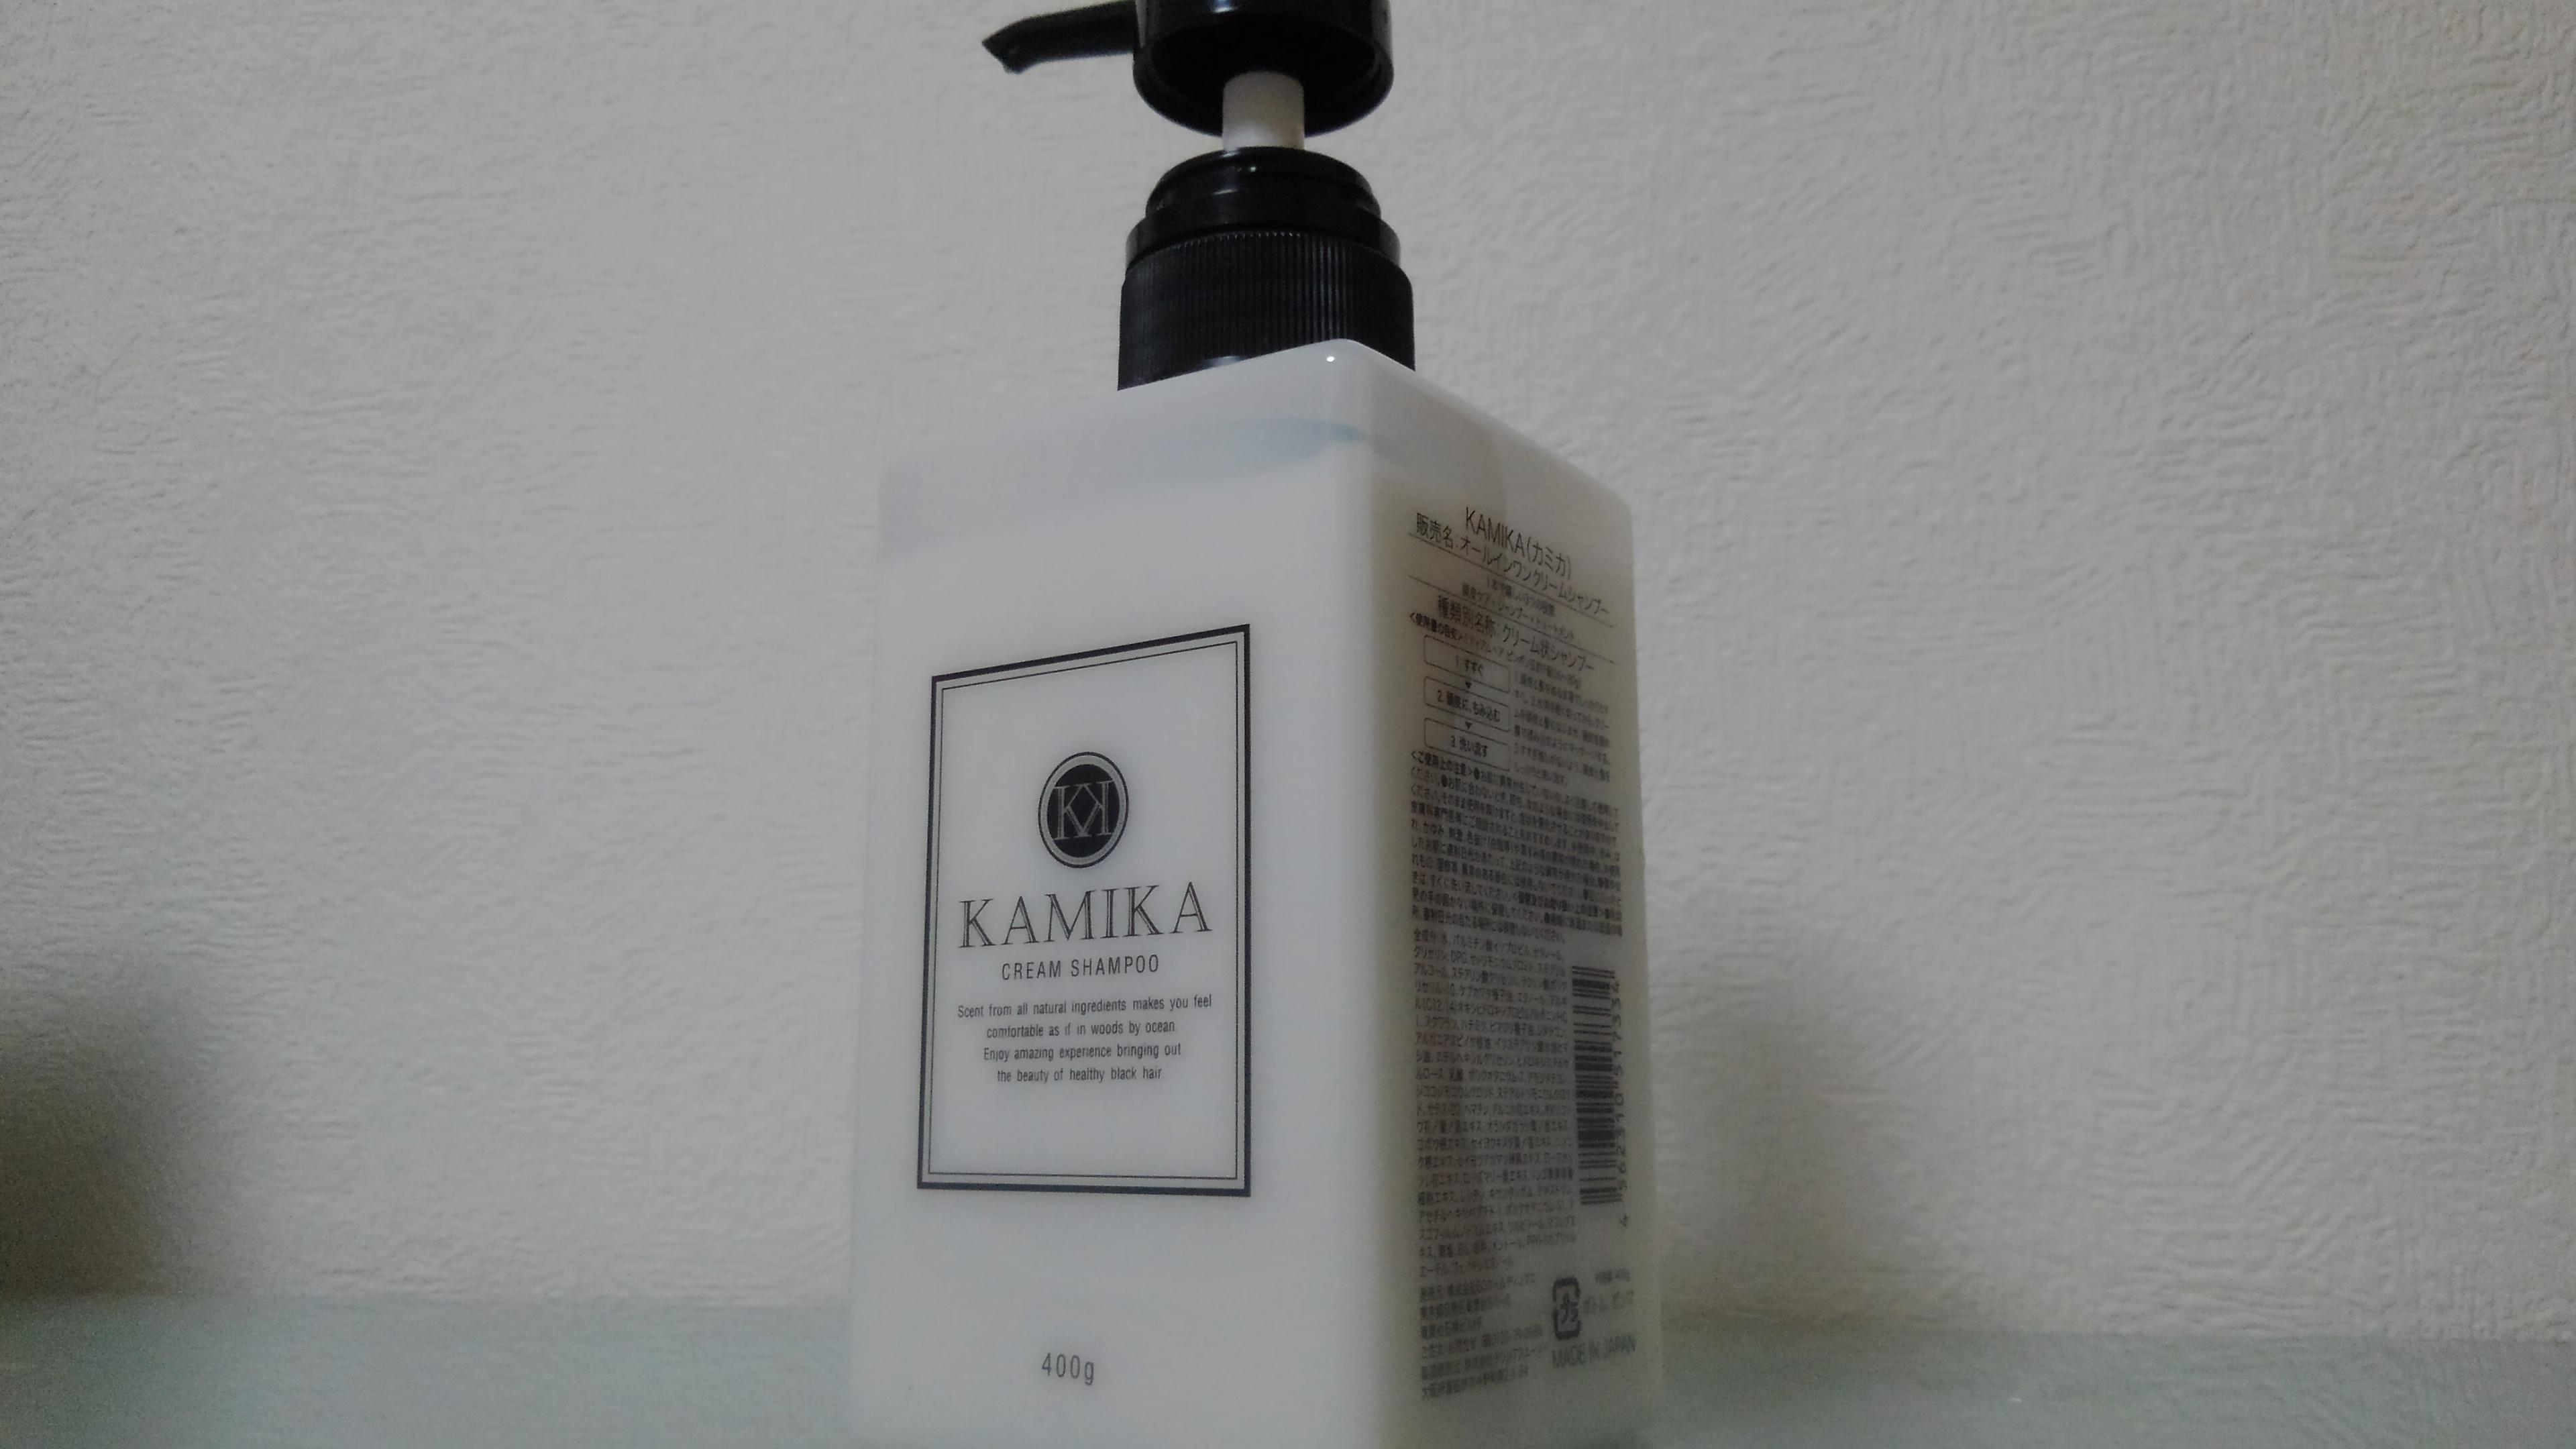 【kamikaレビュー】クリームシャンプーKAMIKA(カミカ)を使ってみた感想